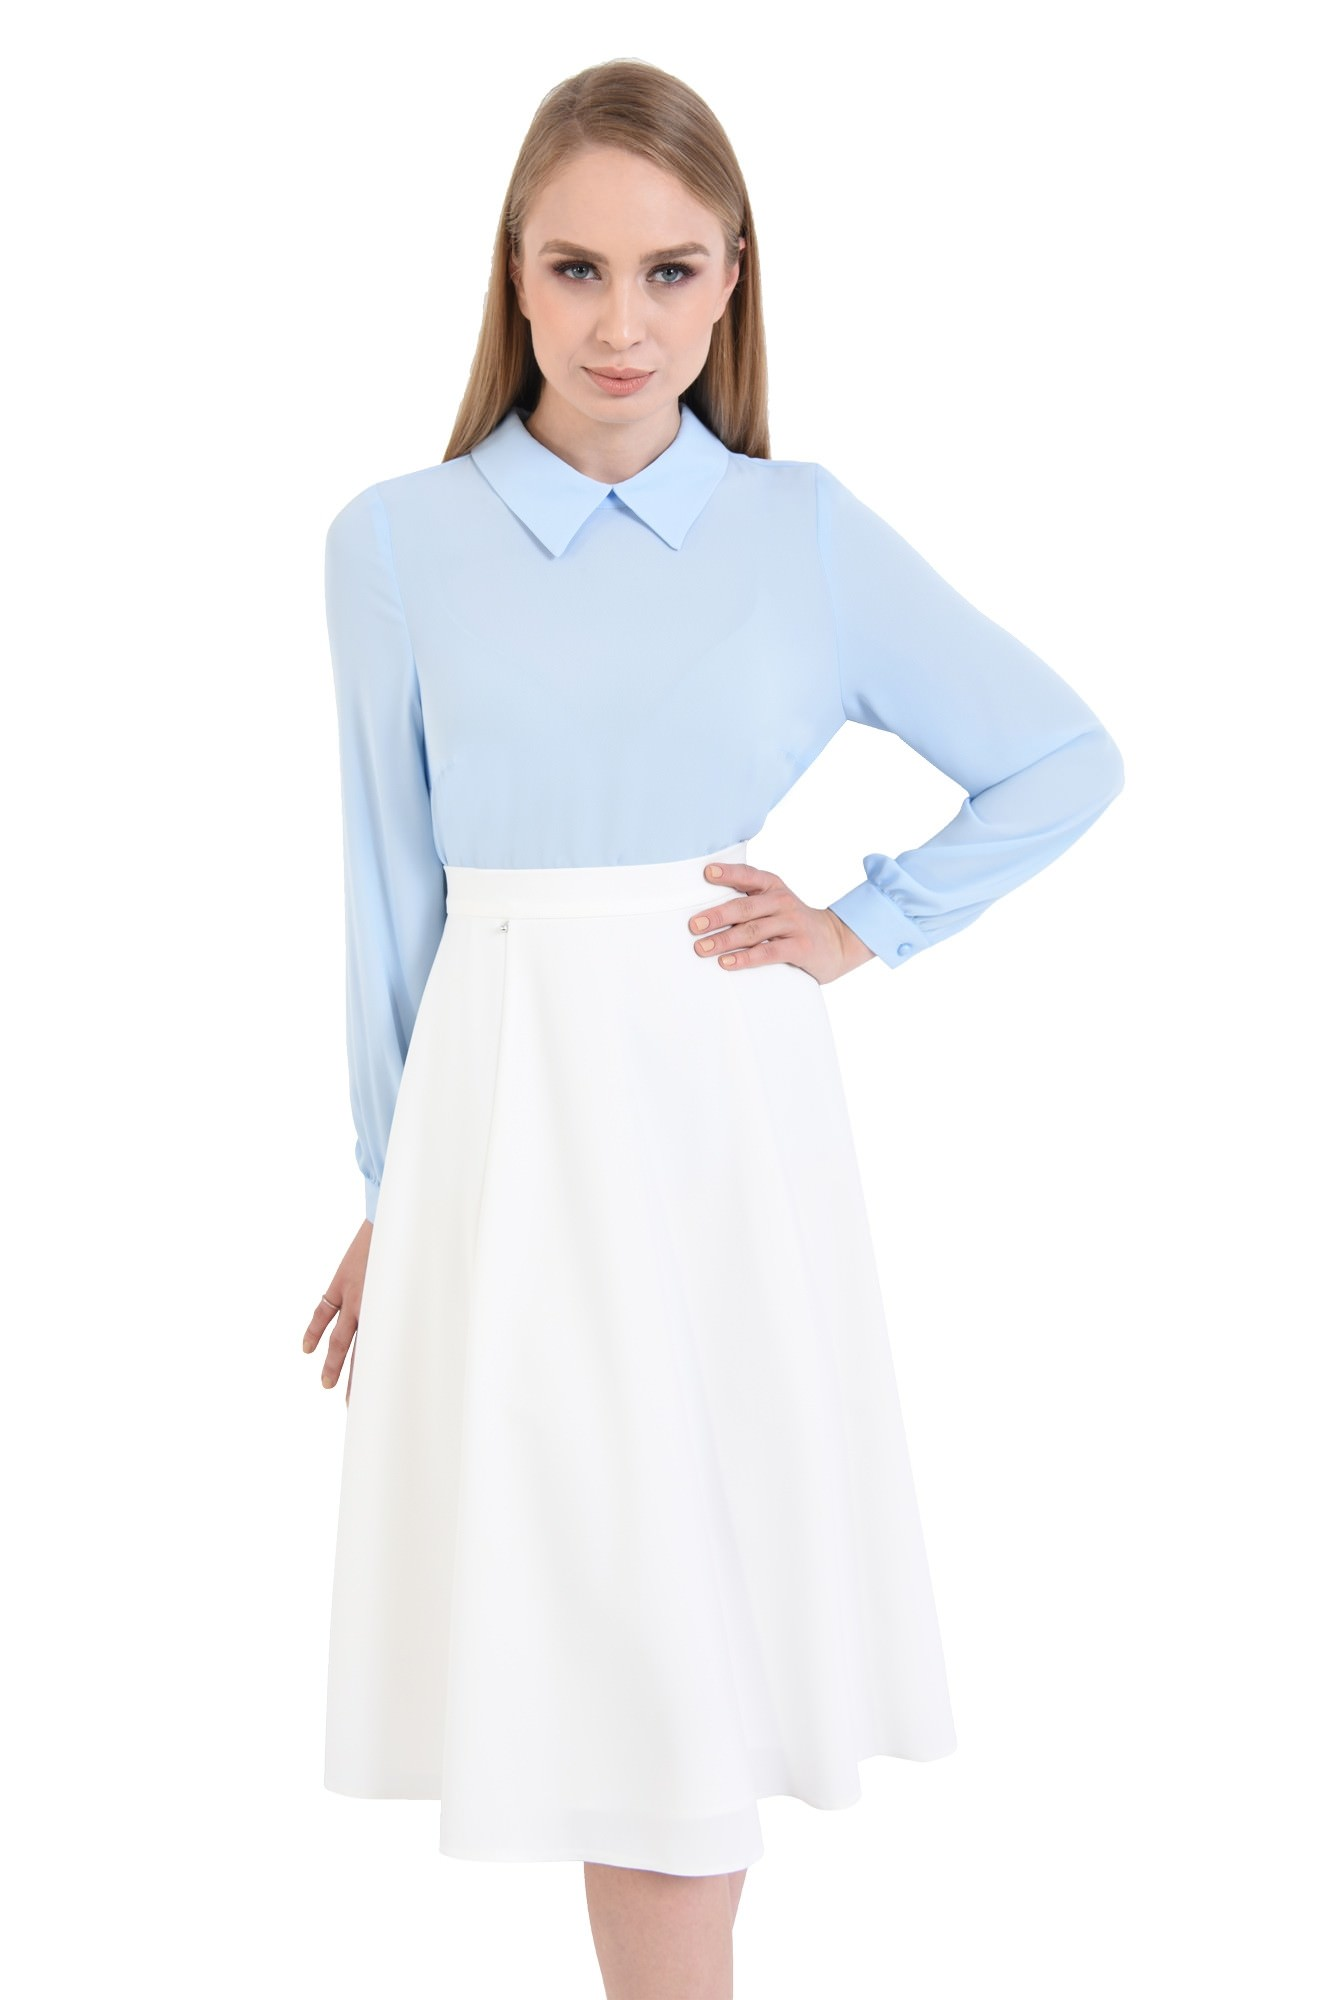 0 - bluza casual, din sifon, bleu